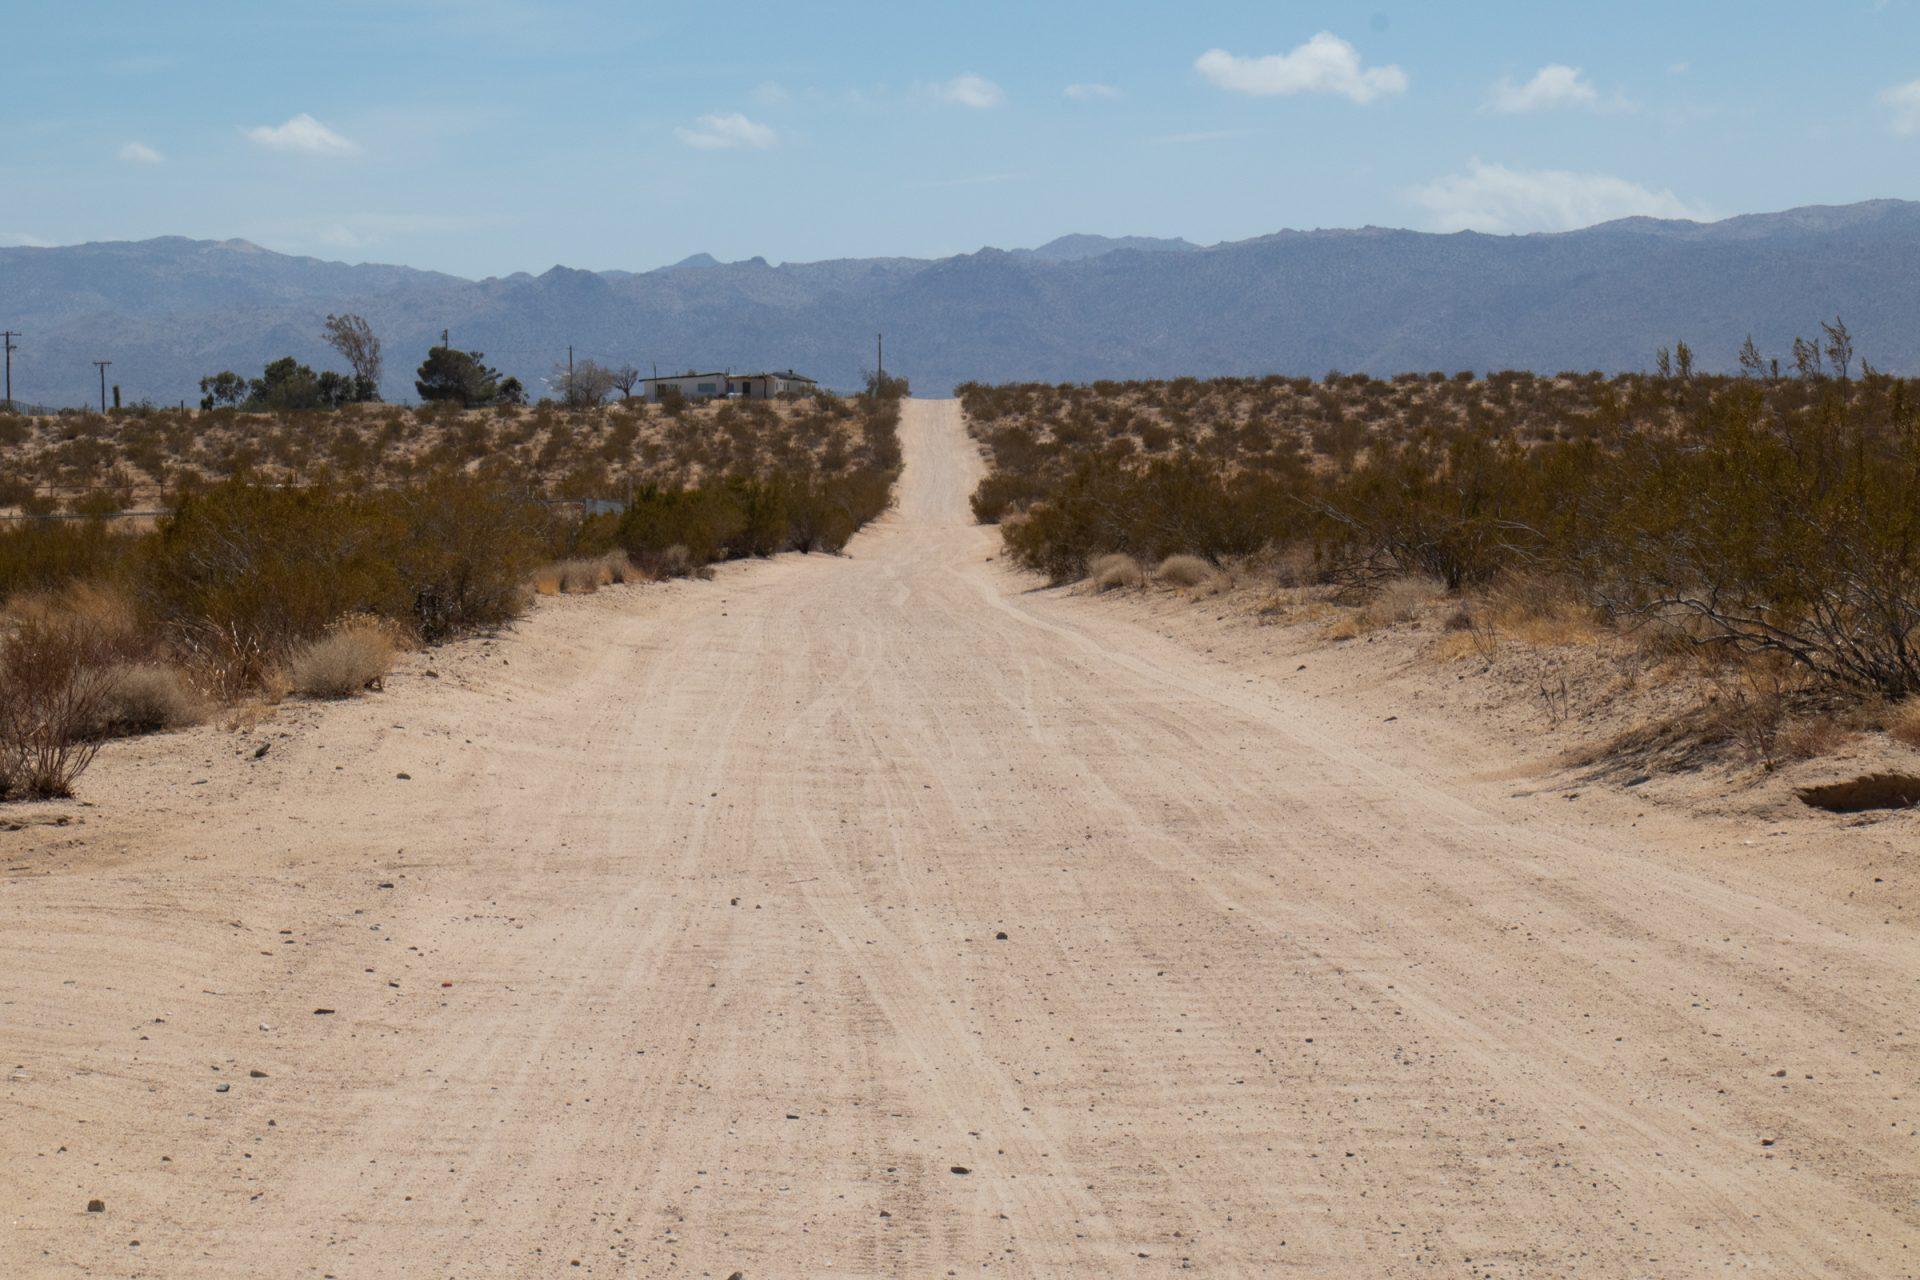 Hills Beyond Empty Dirt Road